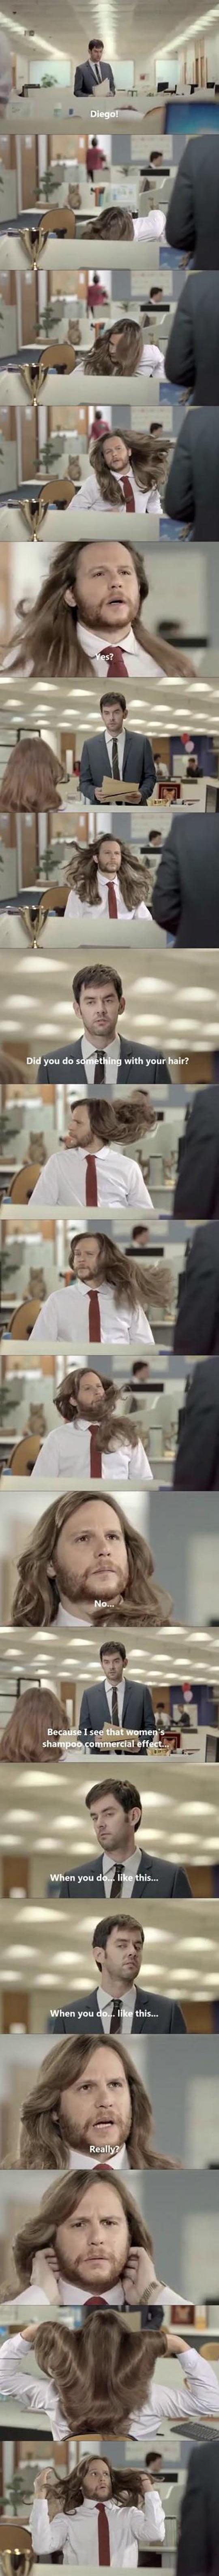 When A Man Uses Women's Shampoo